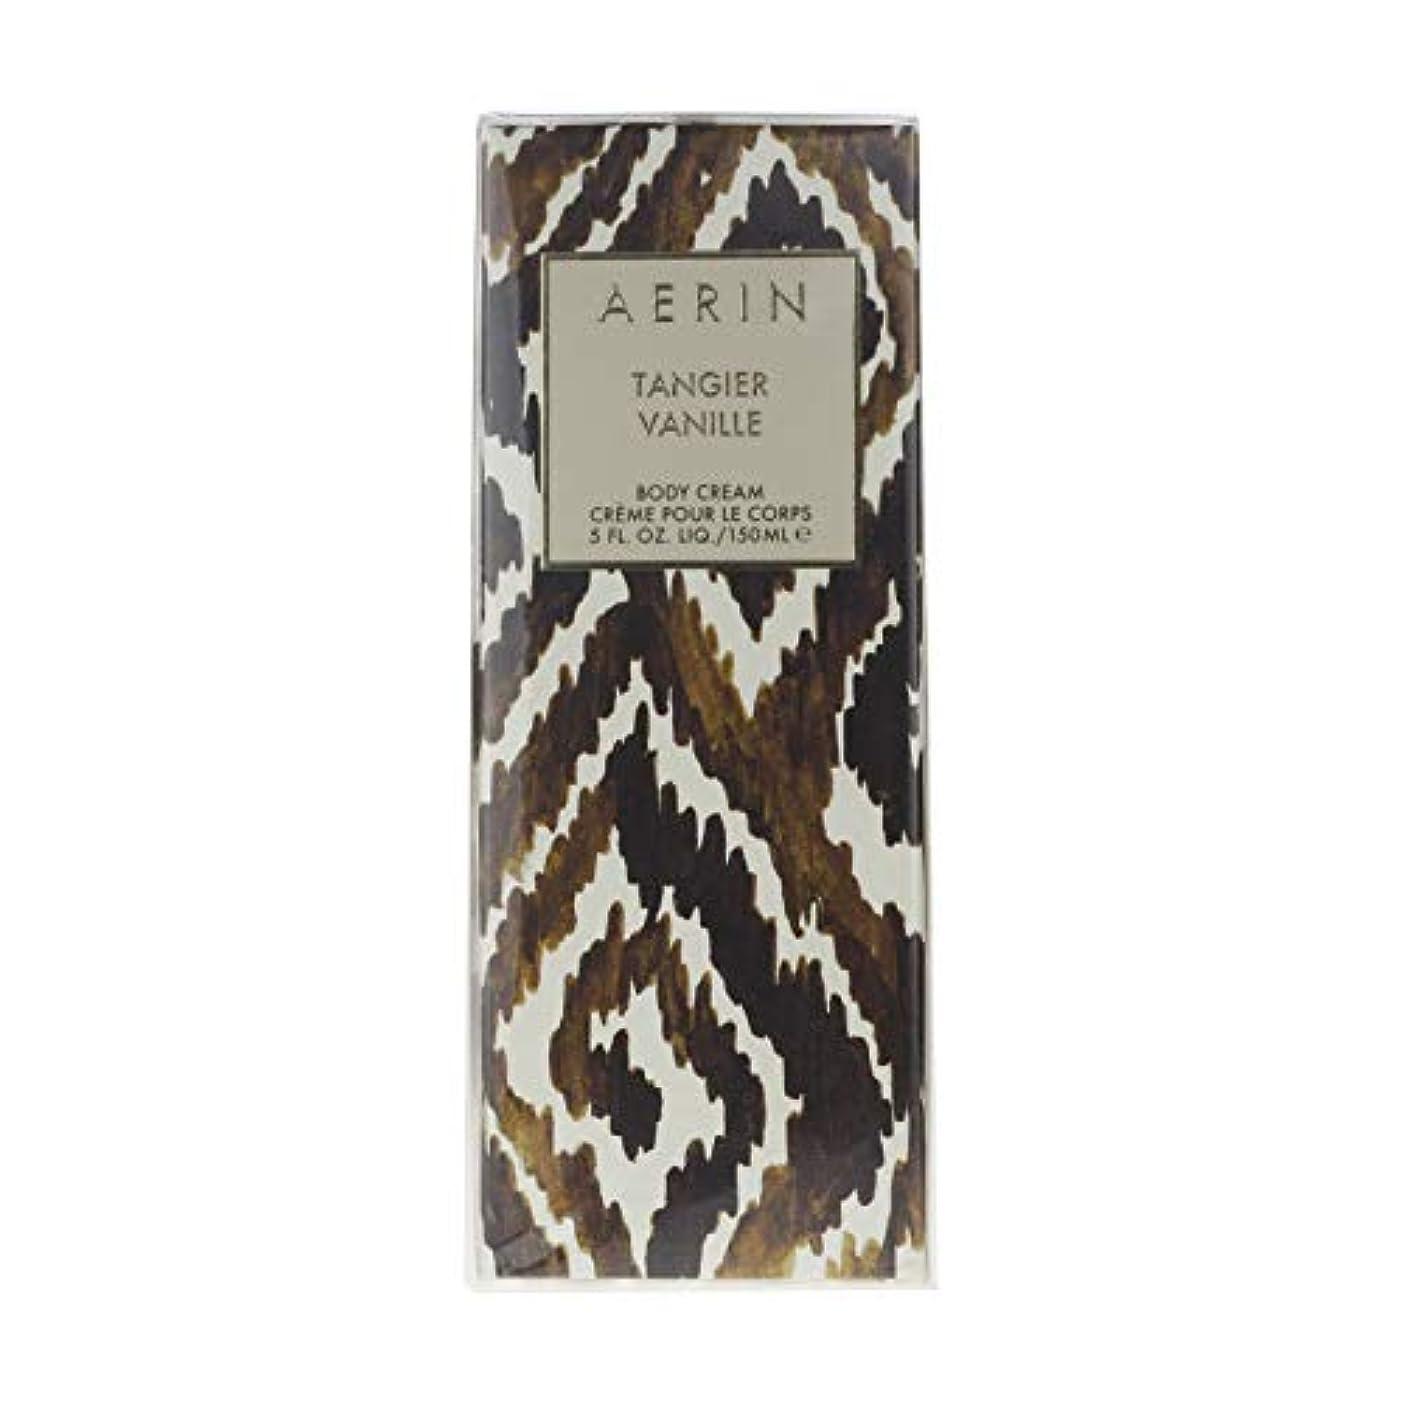 AERIN Tangier Vanille (アエリン タンジヤー バニール) 5.0 oz (150ml) Body Cream by Estee Lauder for Women